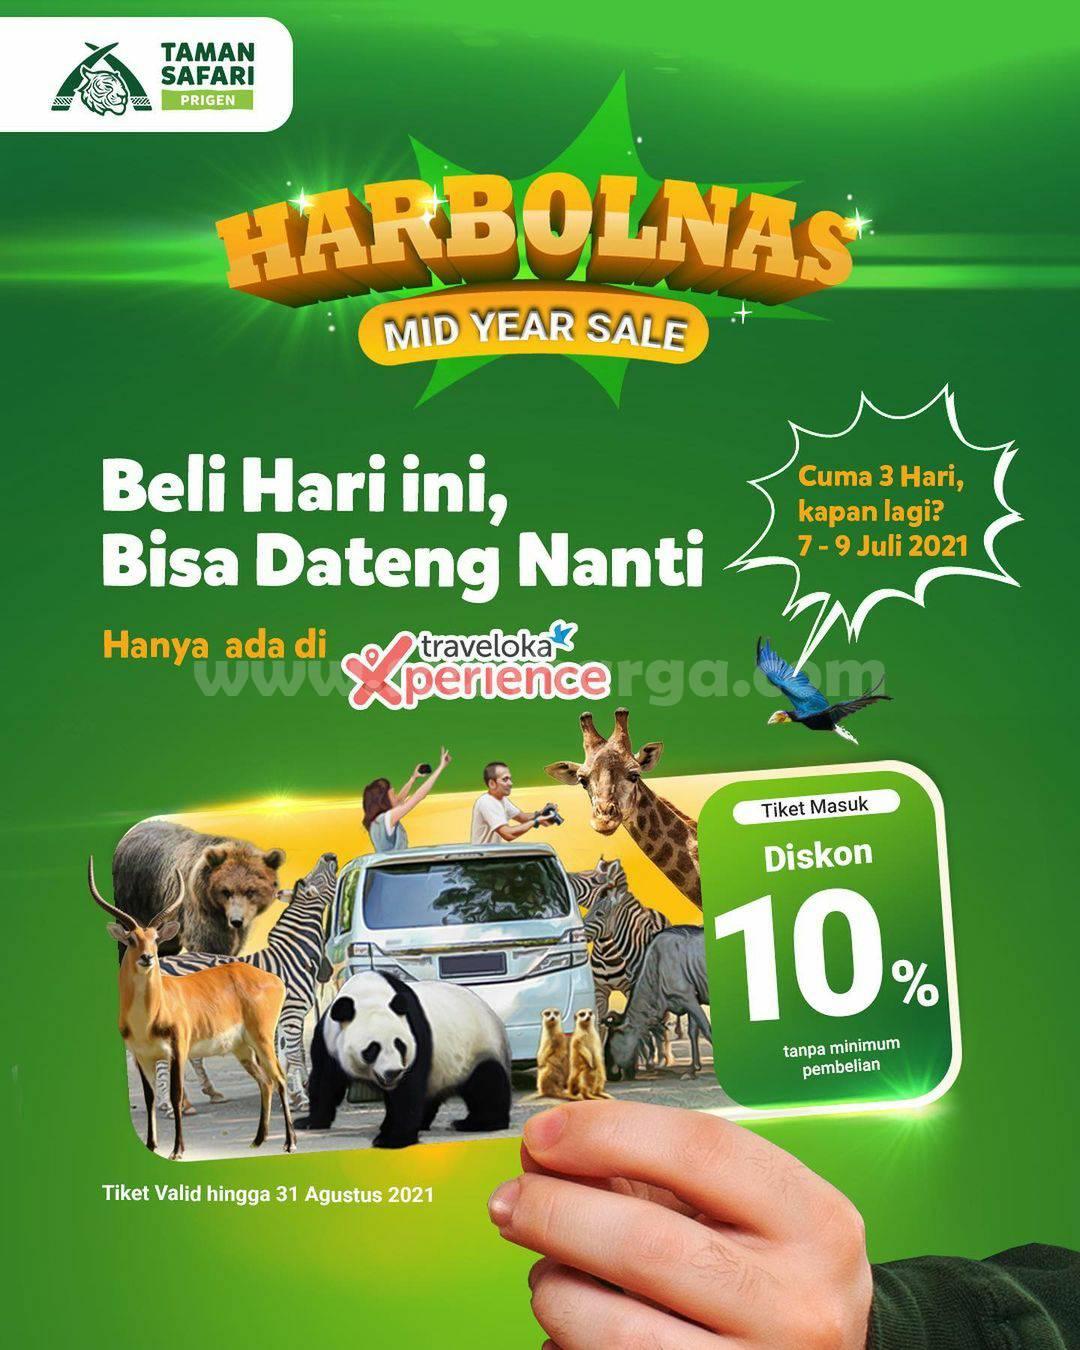 Promo TAMAN SAFARI Spesial HARBOLNAS MID YEAR SALE 6